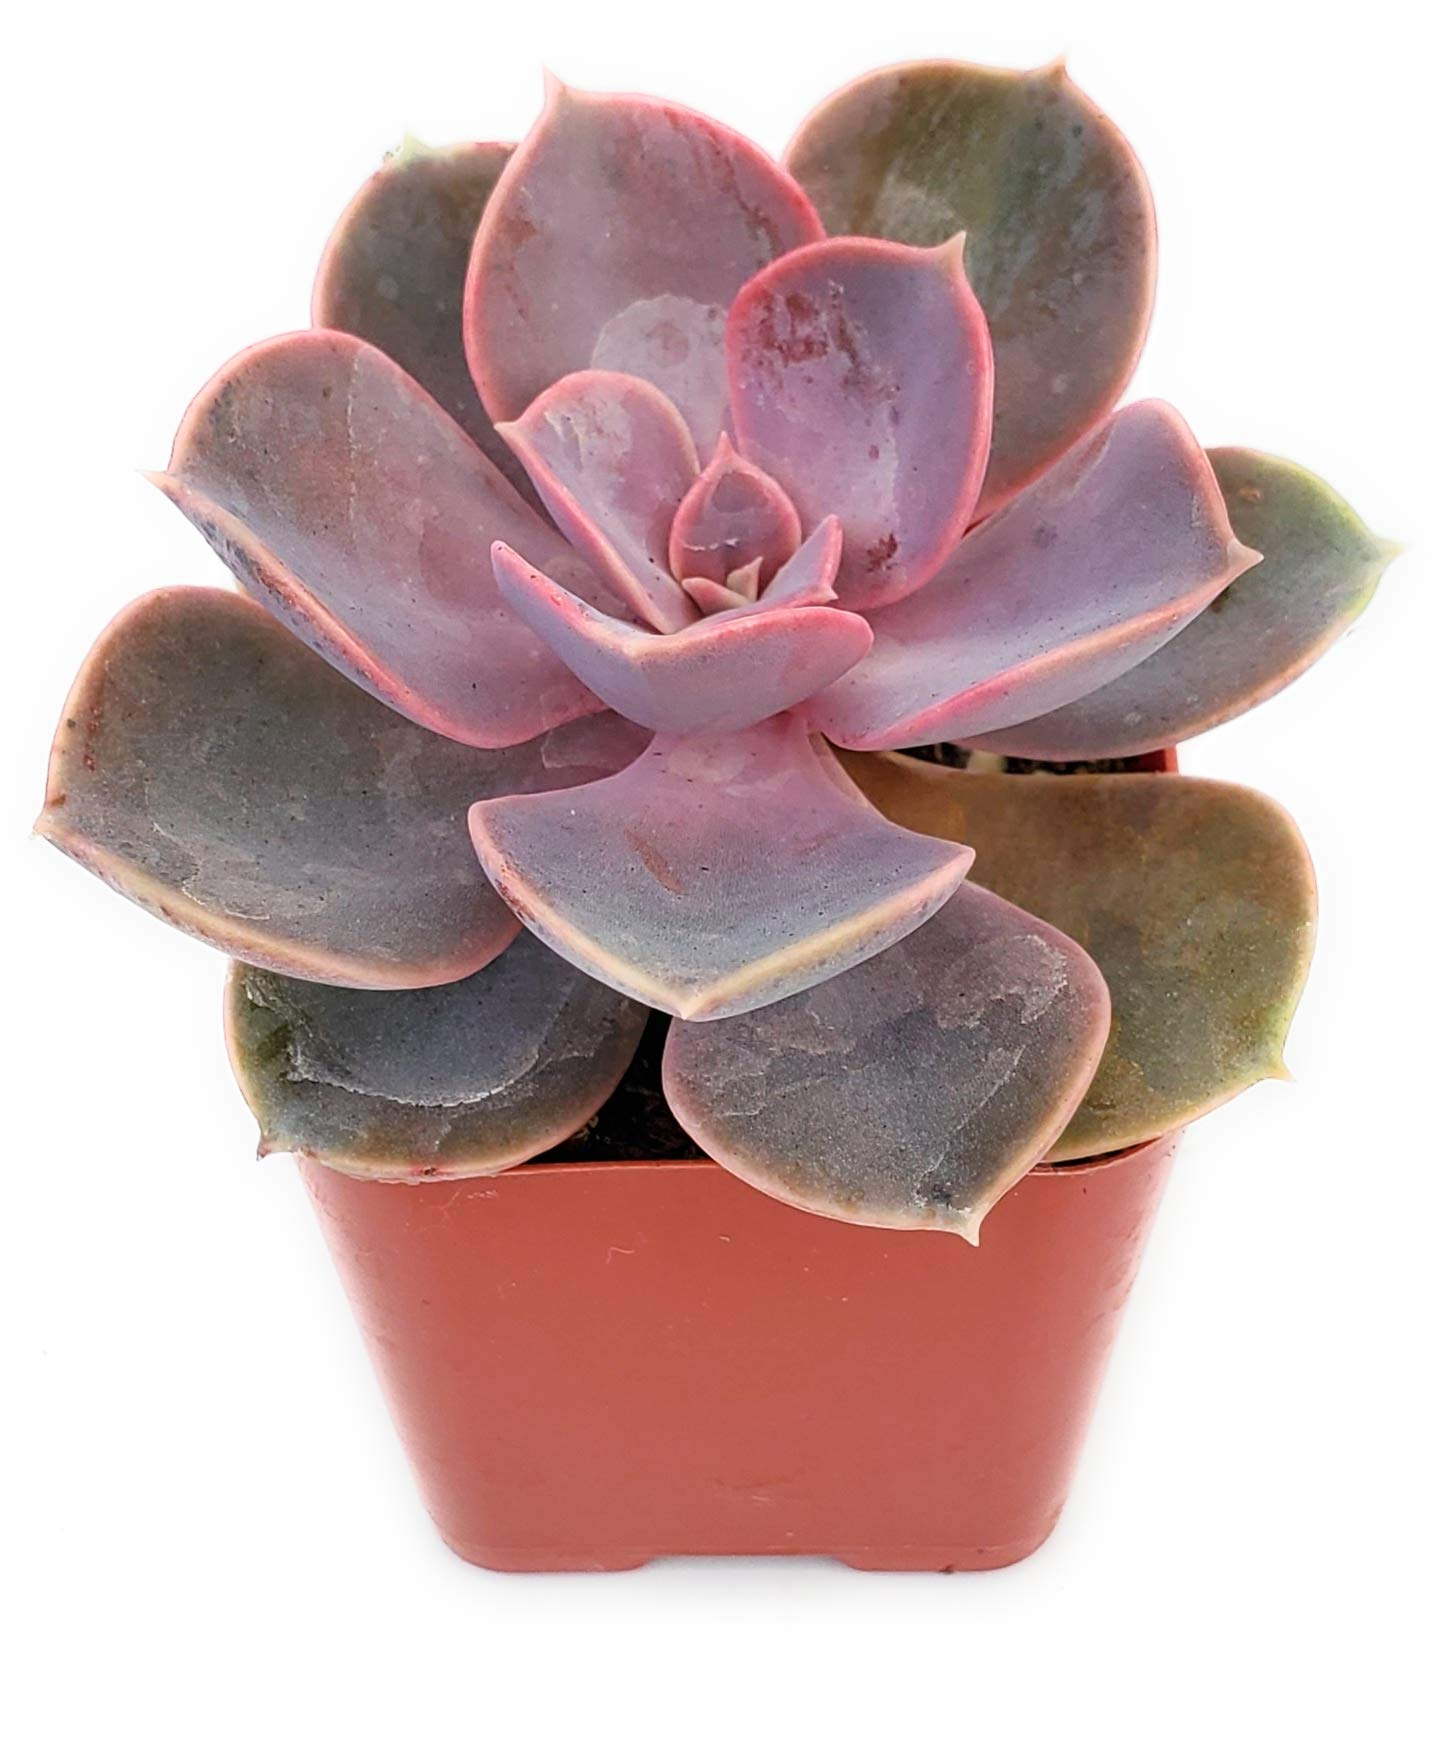 Fat Plants San Diego Live Echeveria Succulent Plant in a 4 inch Plastic Growers Pot (2 inch, Perle von Nurnberg)